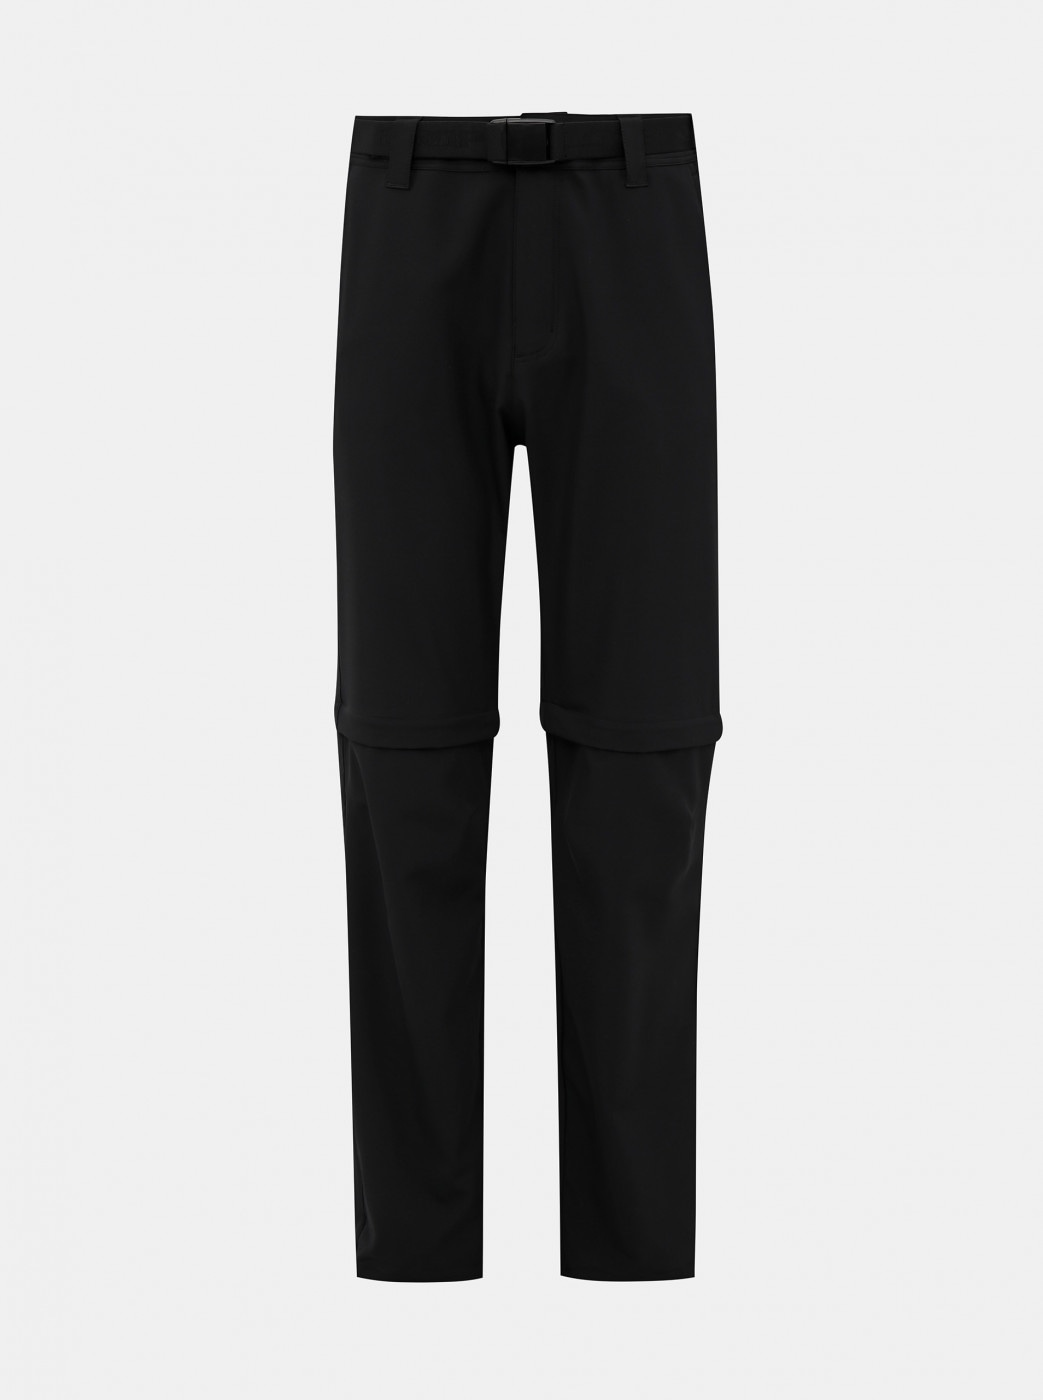 Black Men's Functional Pants/LoAP Urus Shorts